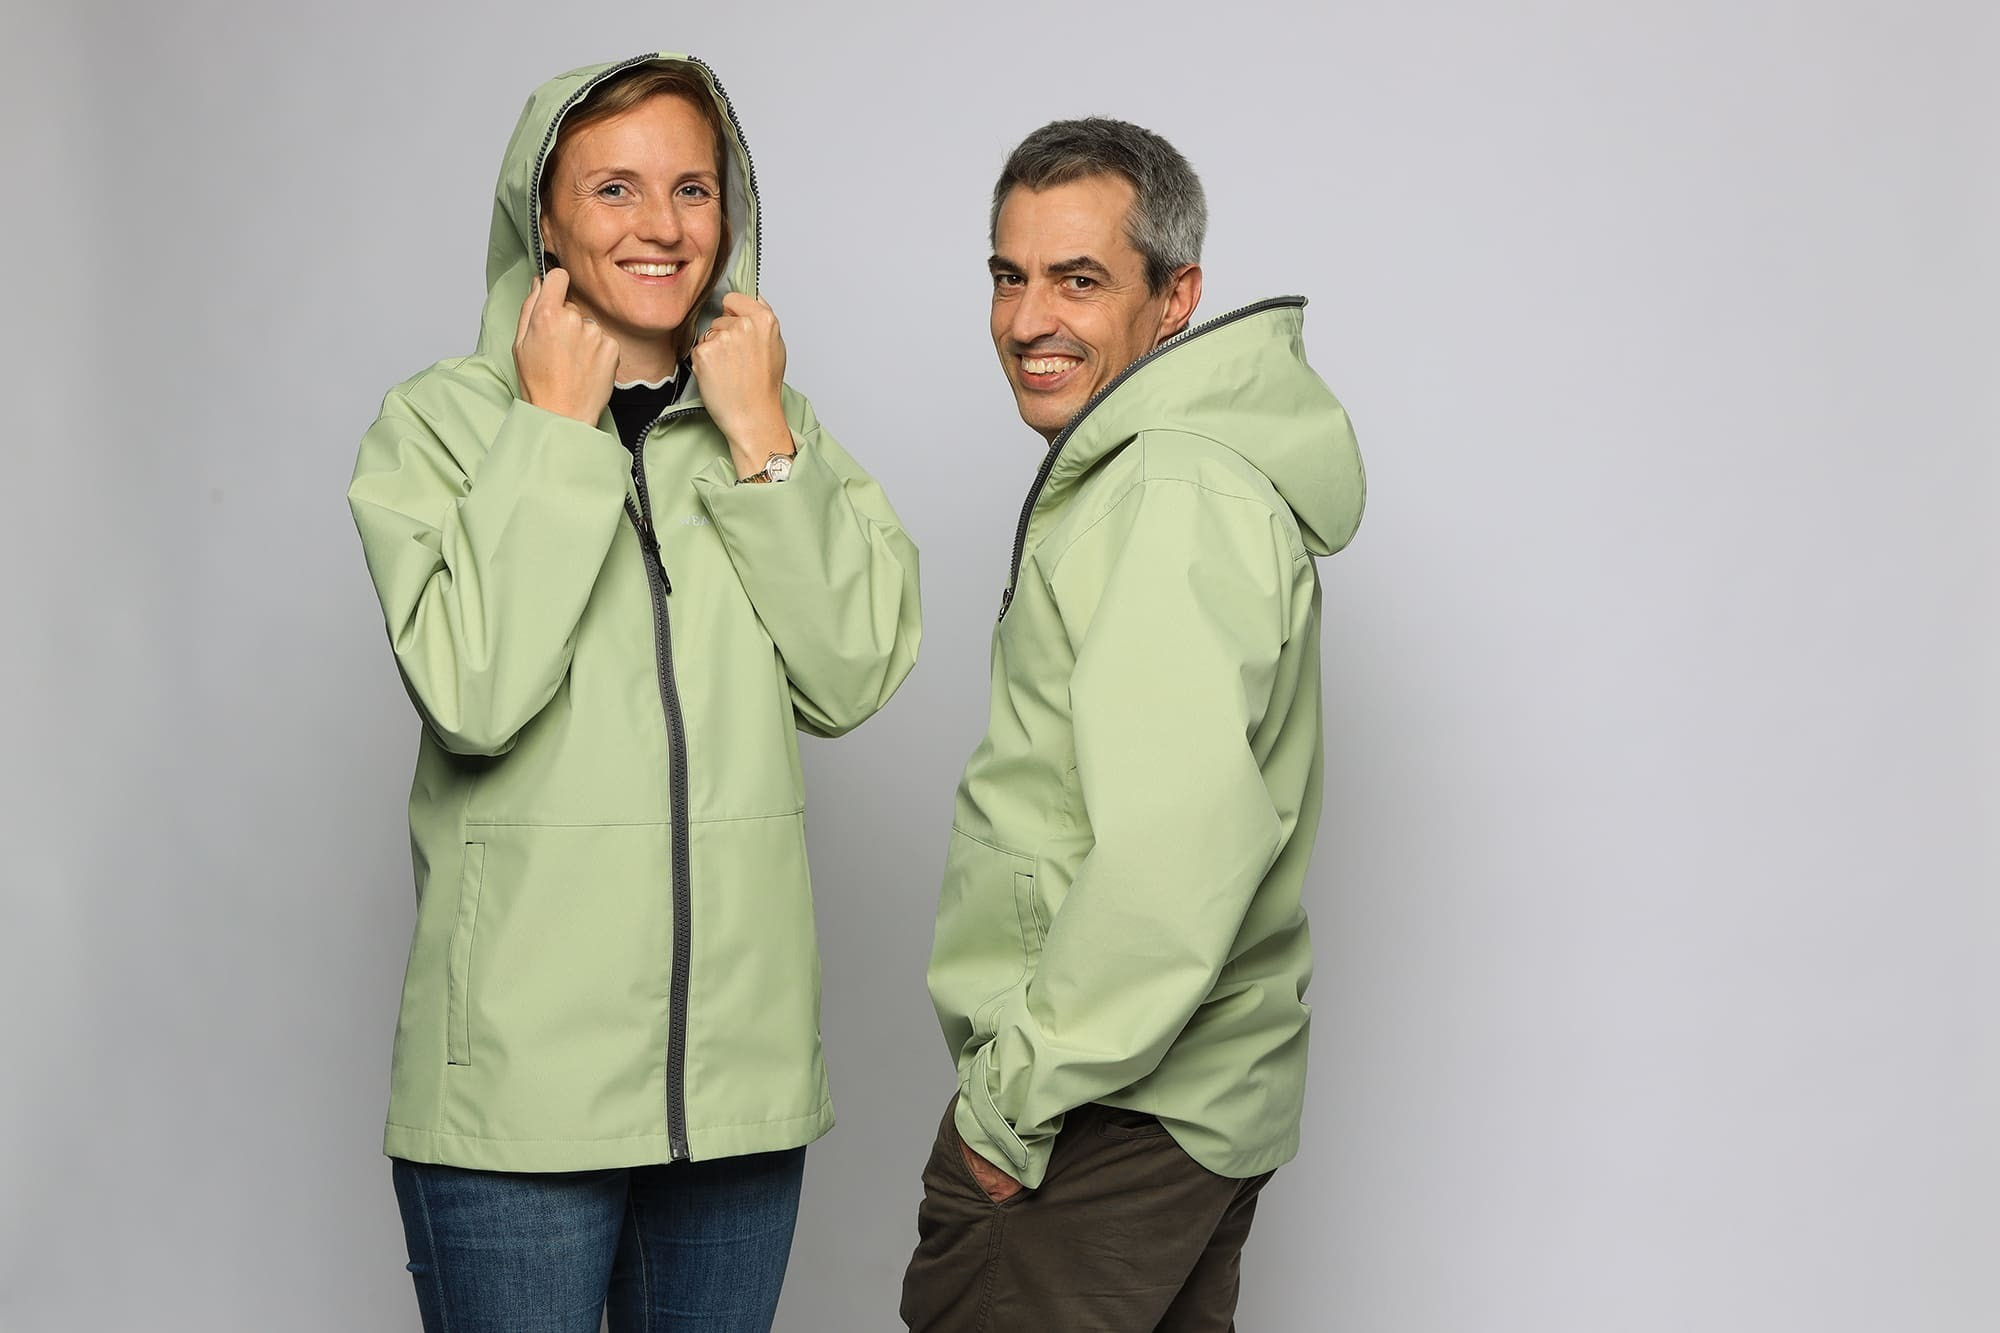 rEvolution Hybrid, Sympatex Tecnologies, Schoeller Textil, circularidad textil, ISPO, wear2wear